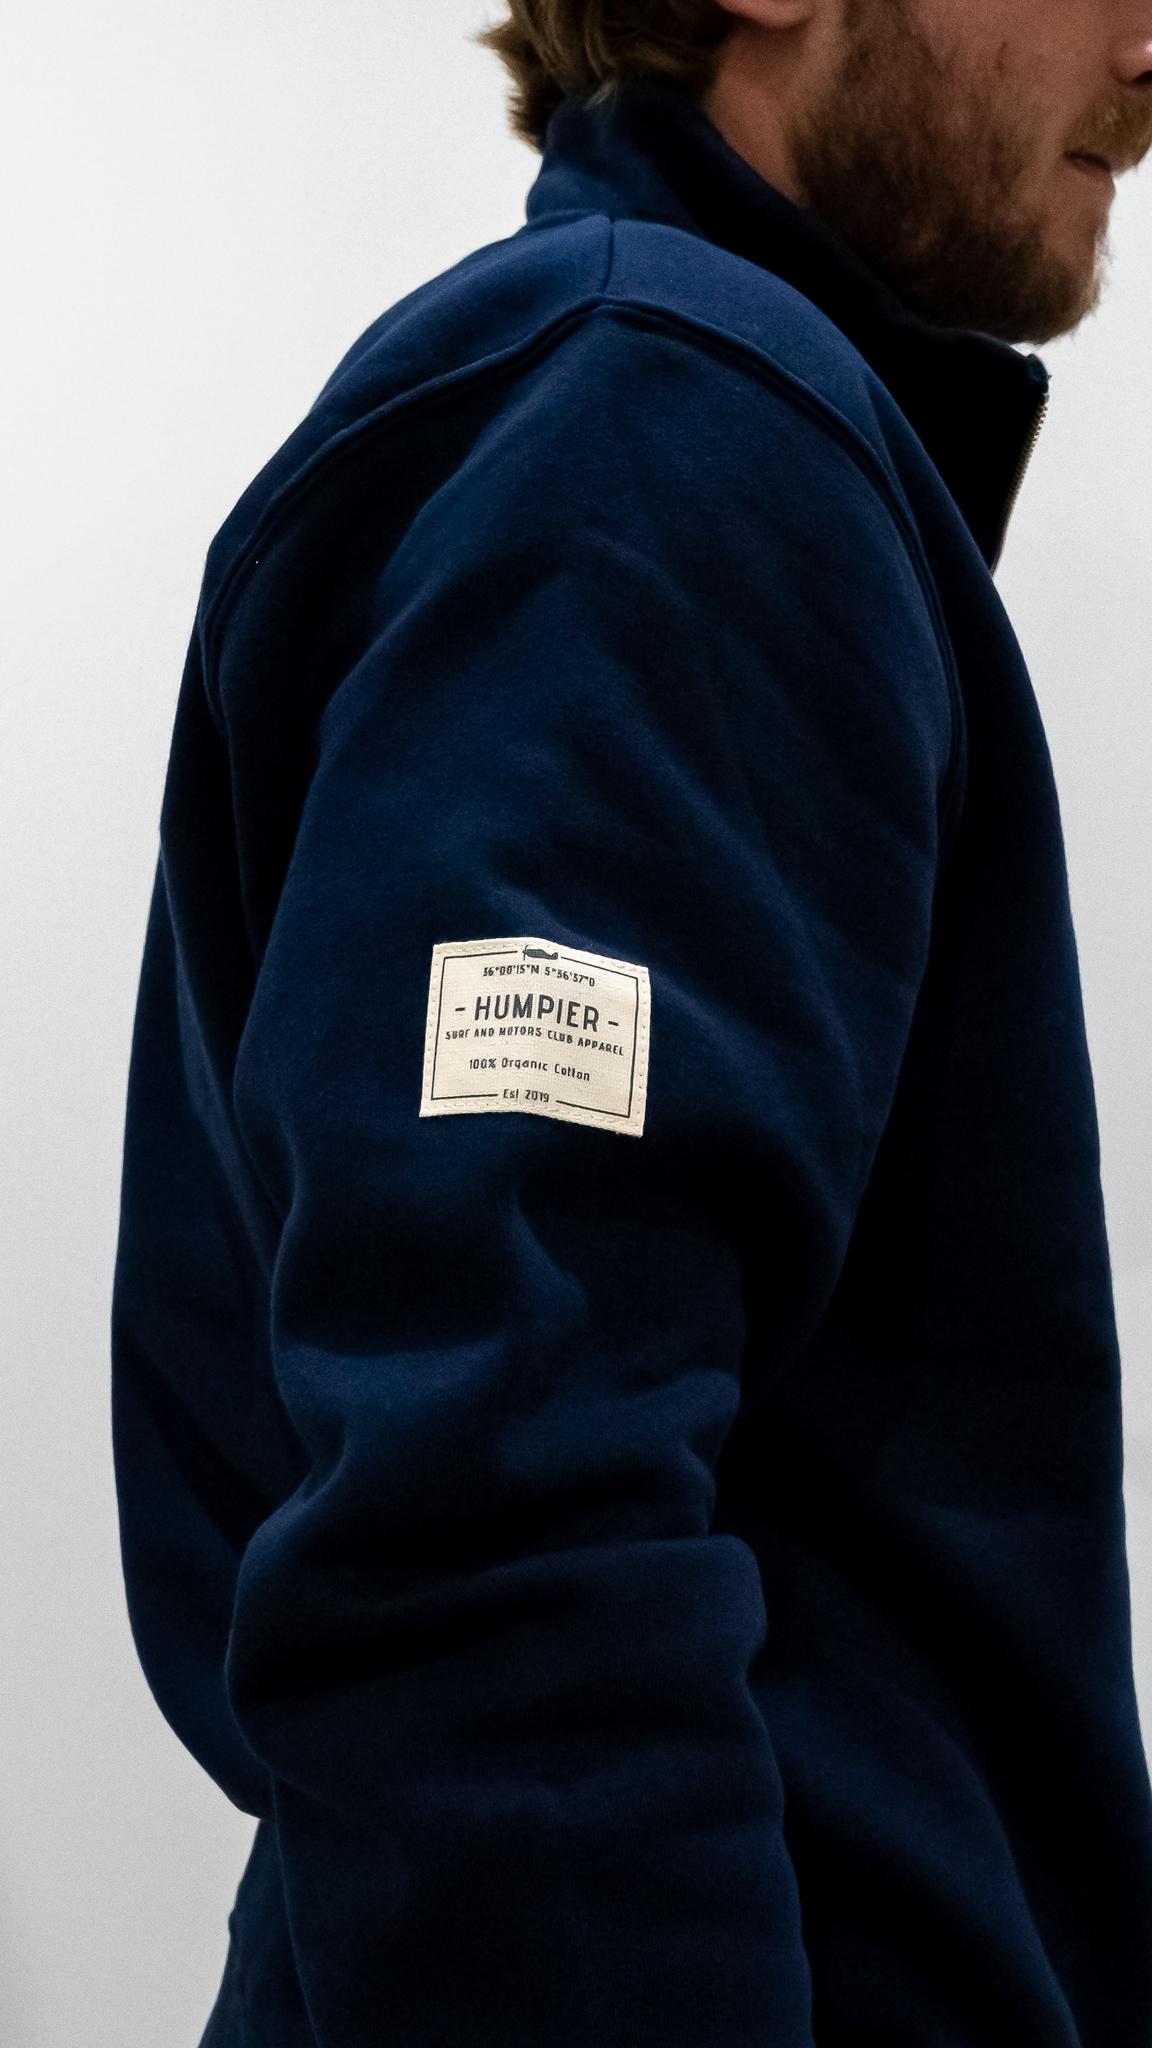 Jersey Cremallera Azul   Humpier